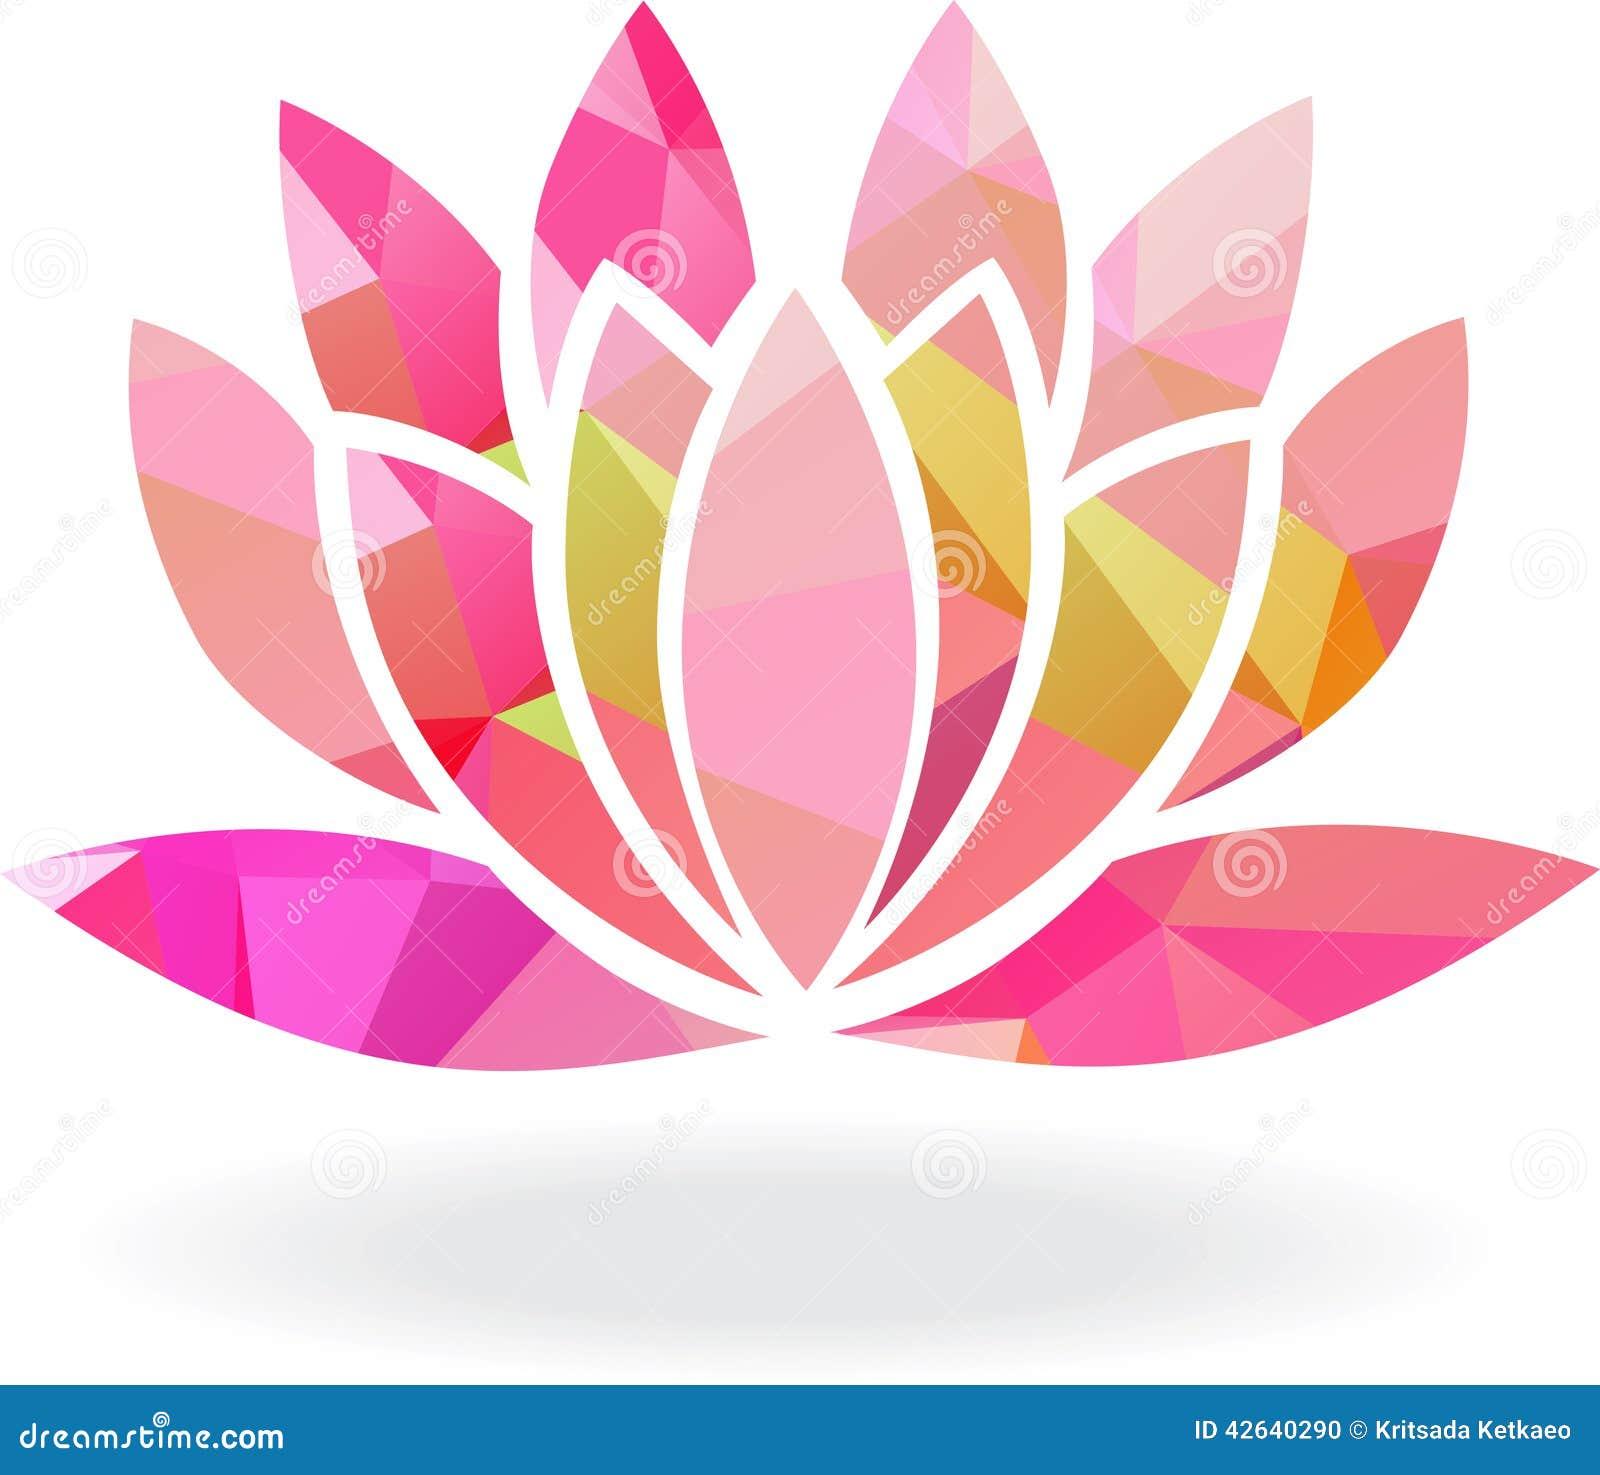 Flor de lótus geométrica abstrata em cores múltiplas